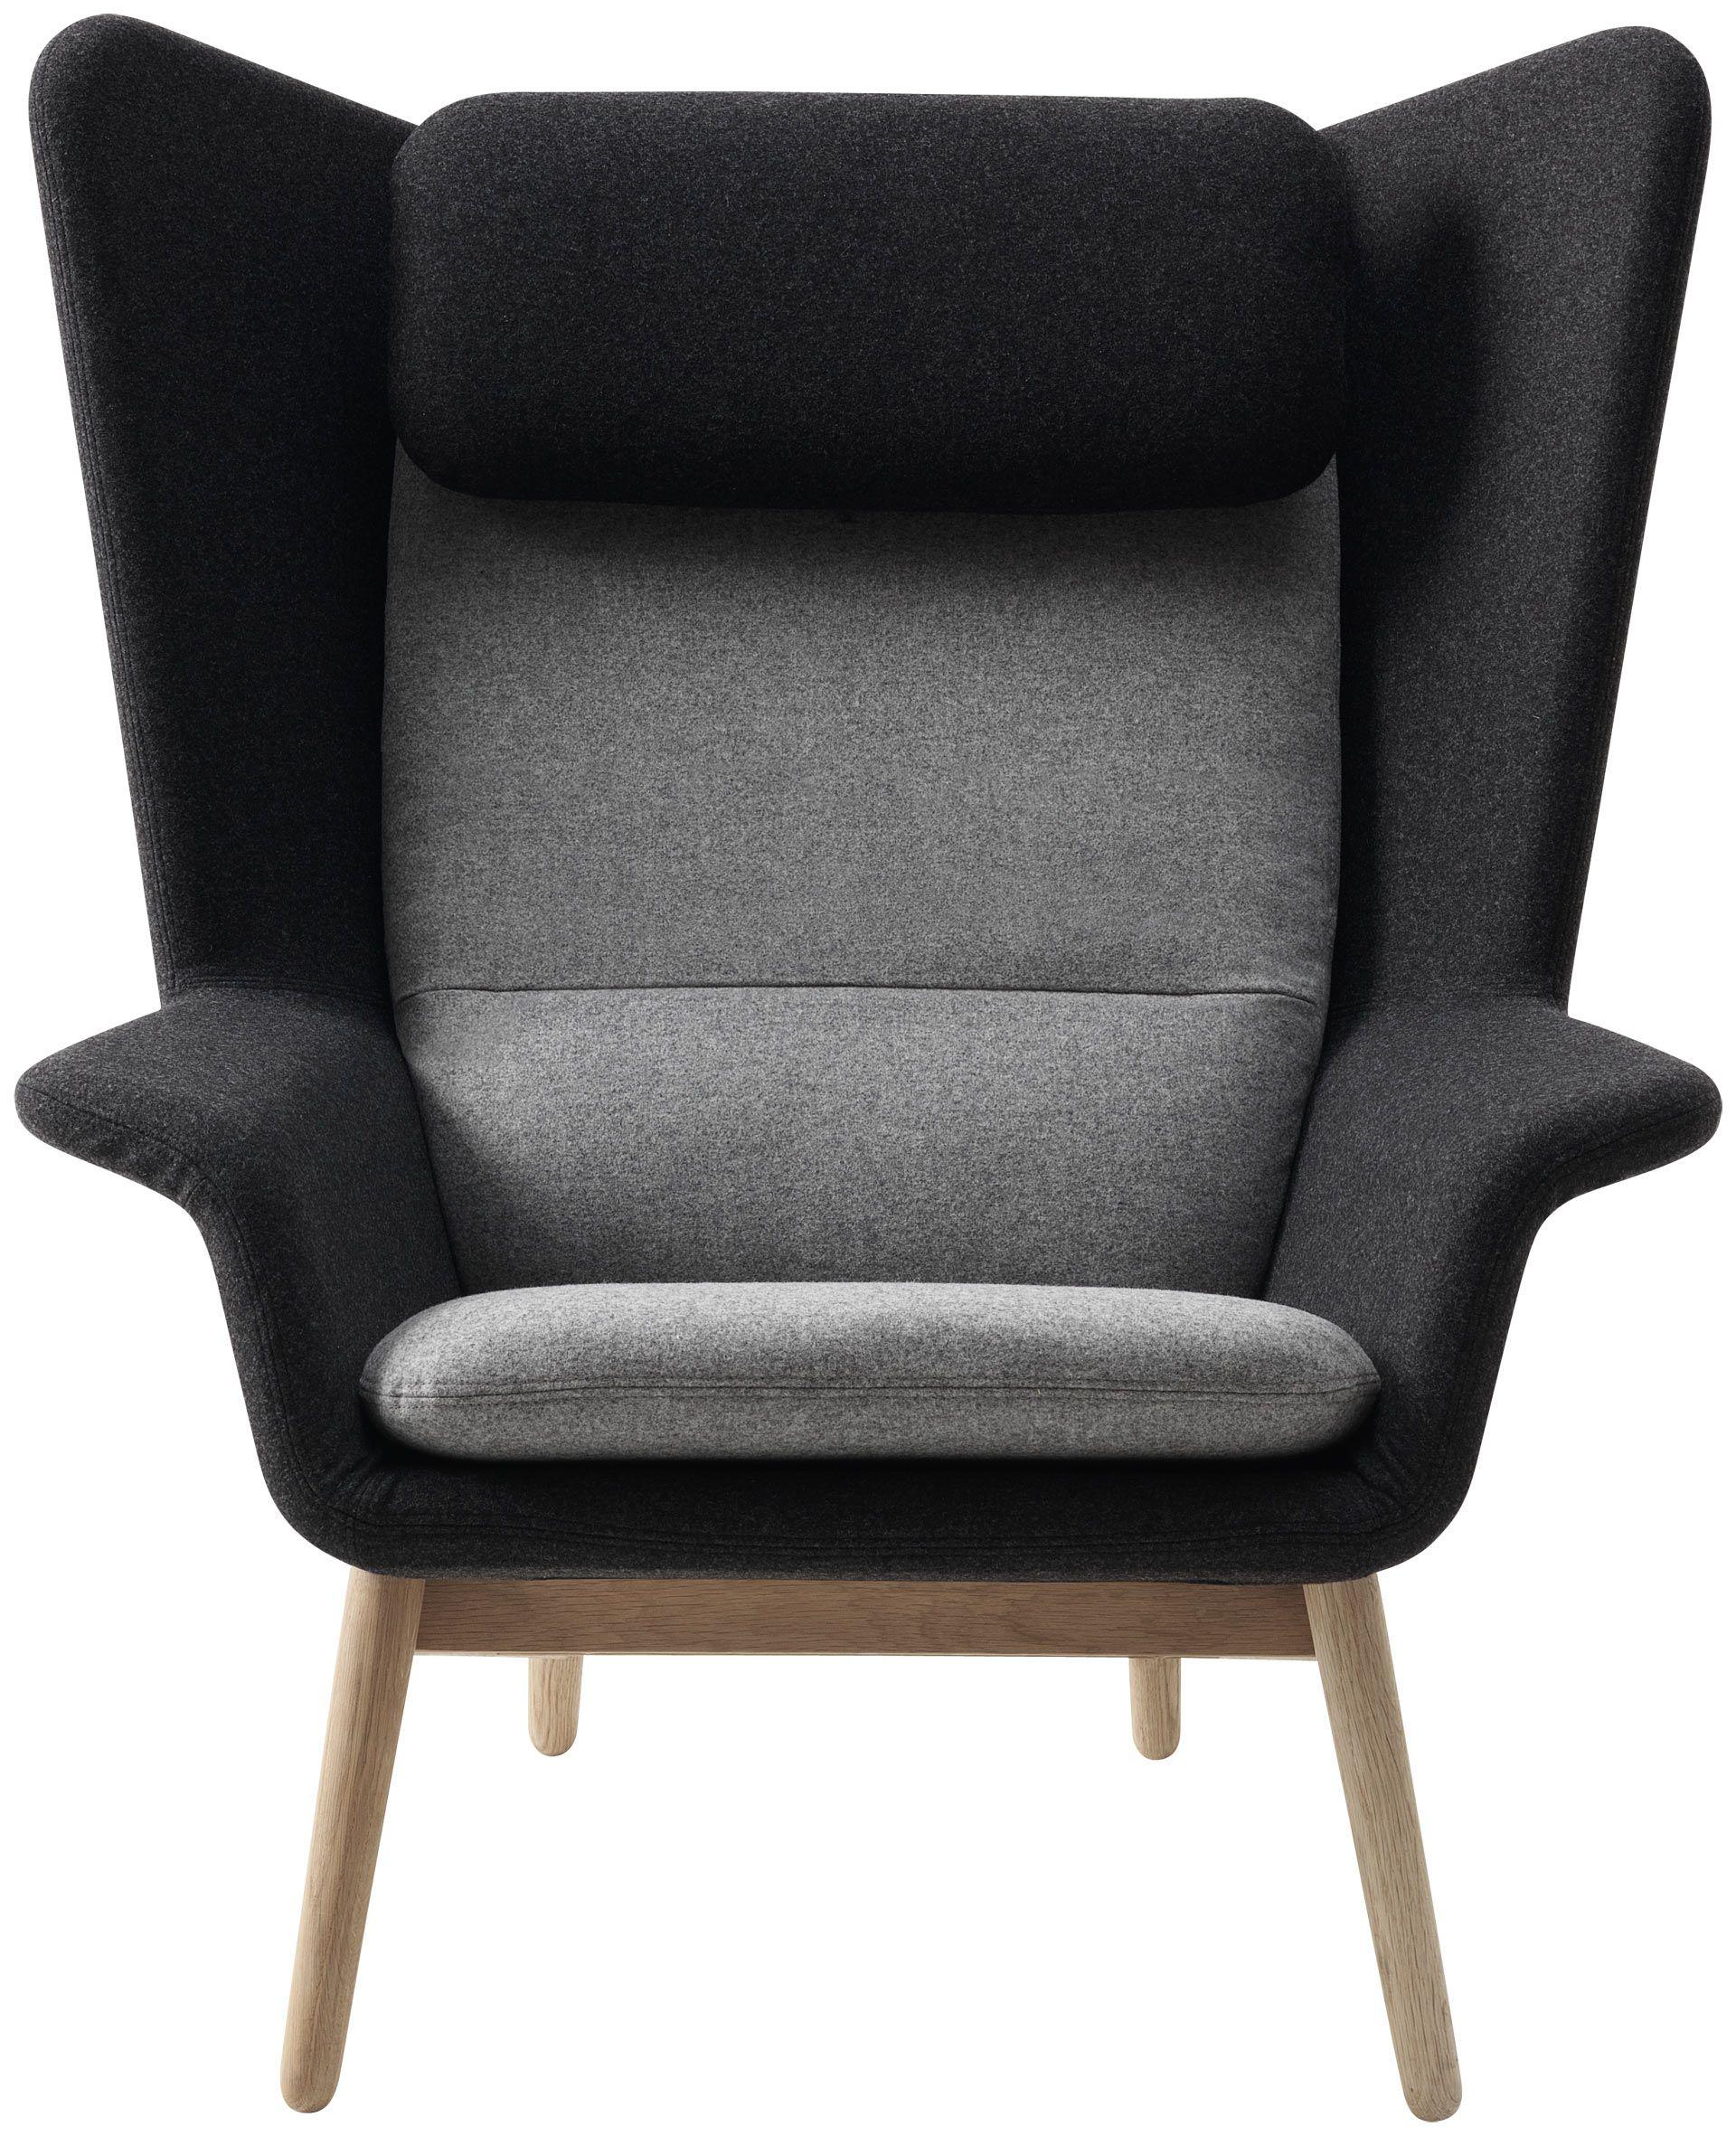 Boconcept hamilton chair two toned grey felt design Beo concept